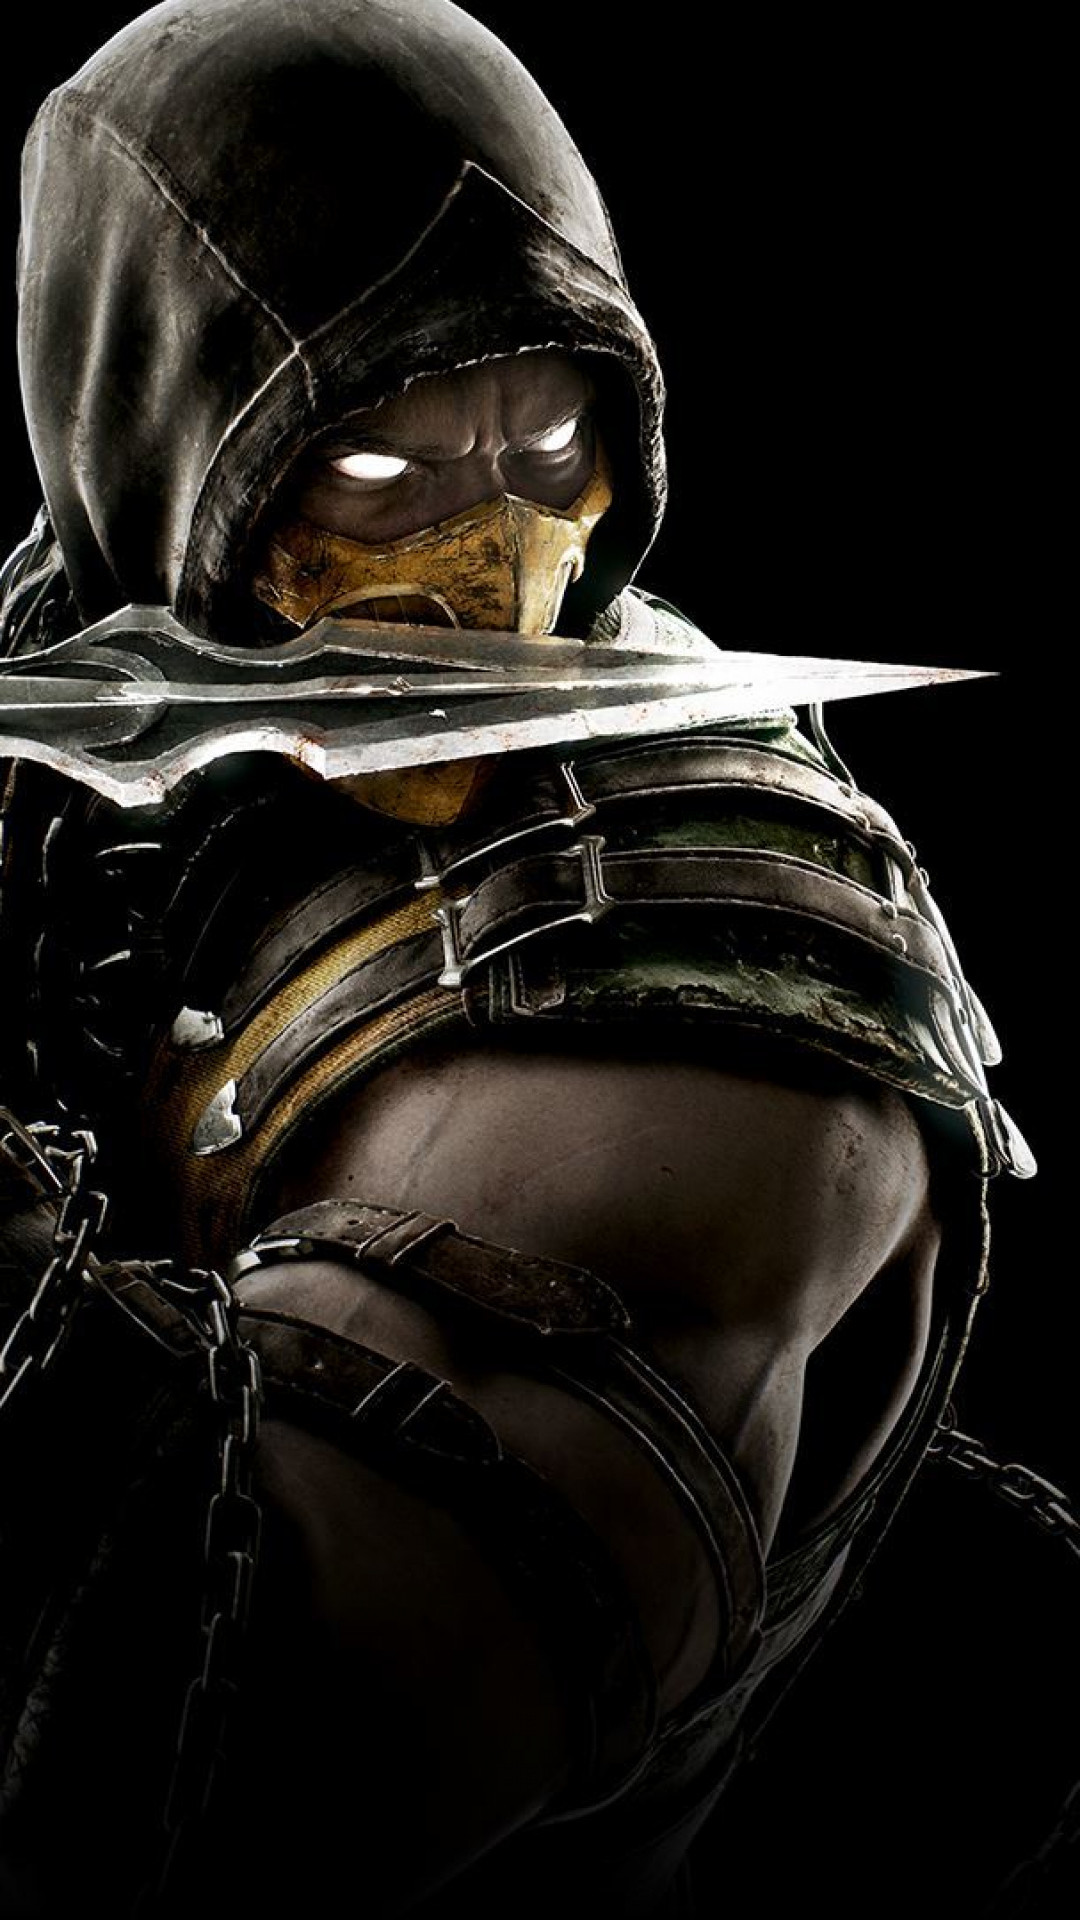 Mortal Kombat Online: Mortal Kombat Scorpion Wallpaper (68+ Images